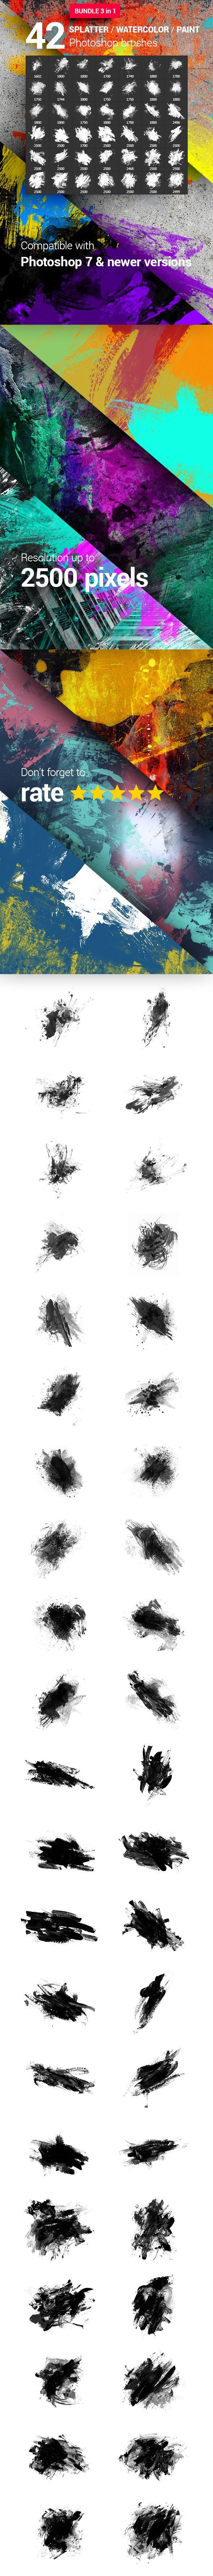 42 Watercolor Splatter Paint Photoshop Brushes Bundle — Photoshop ABR #stain #photoshop • Download ➝ https://graphicriver.net/item/42-watercolor-splatter-paint-photoshop-brushes-bundle/20195275?ref=pxcr